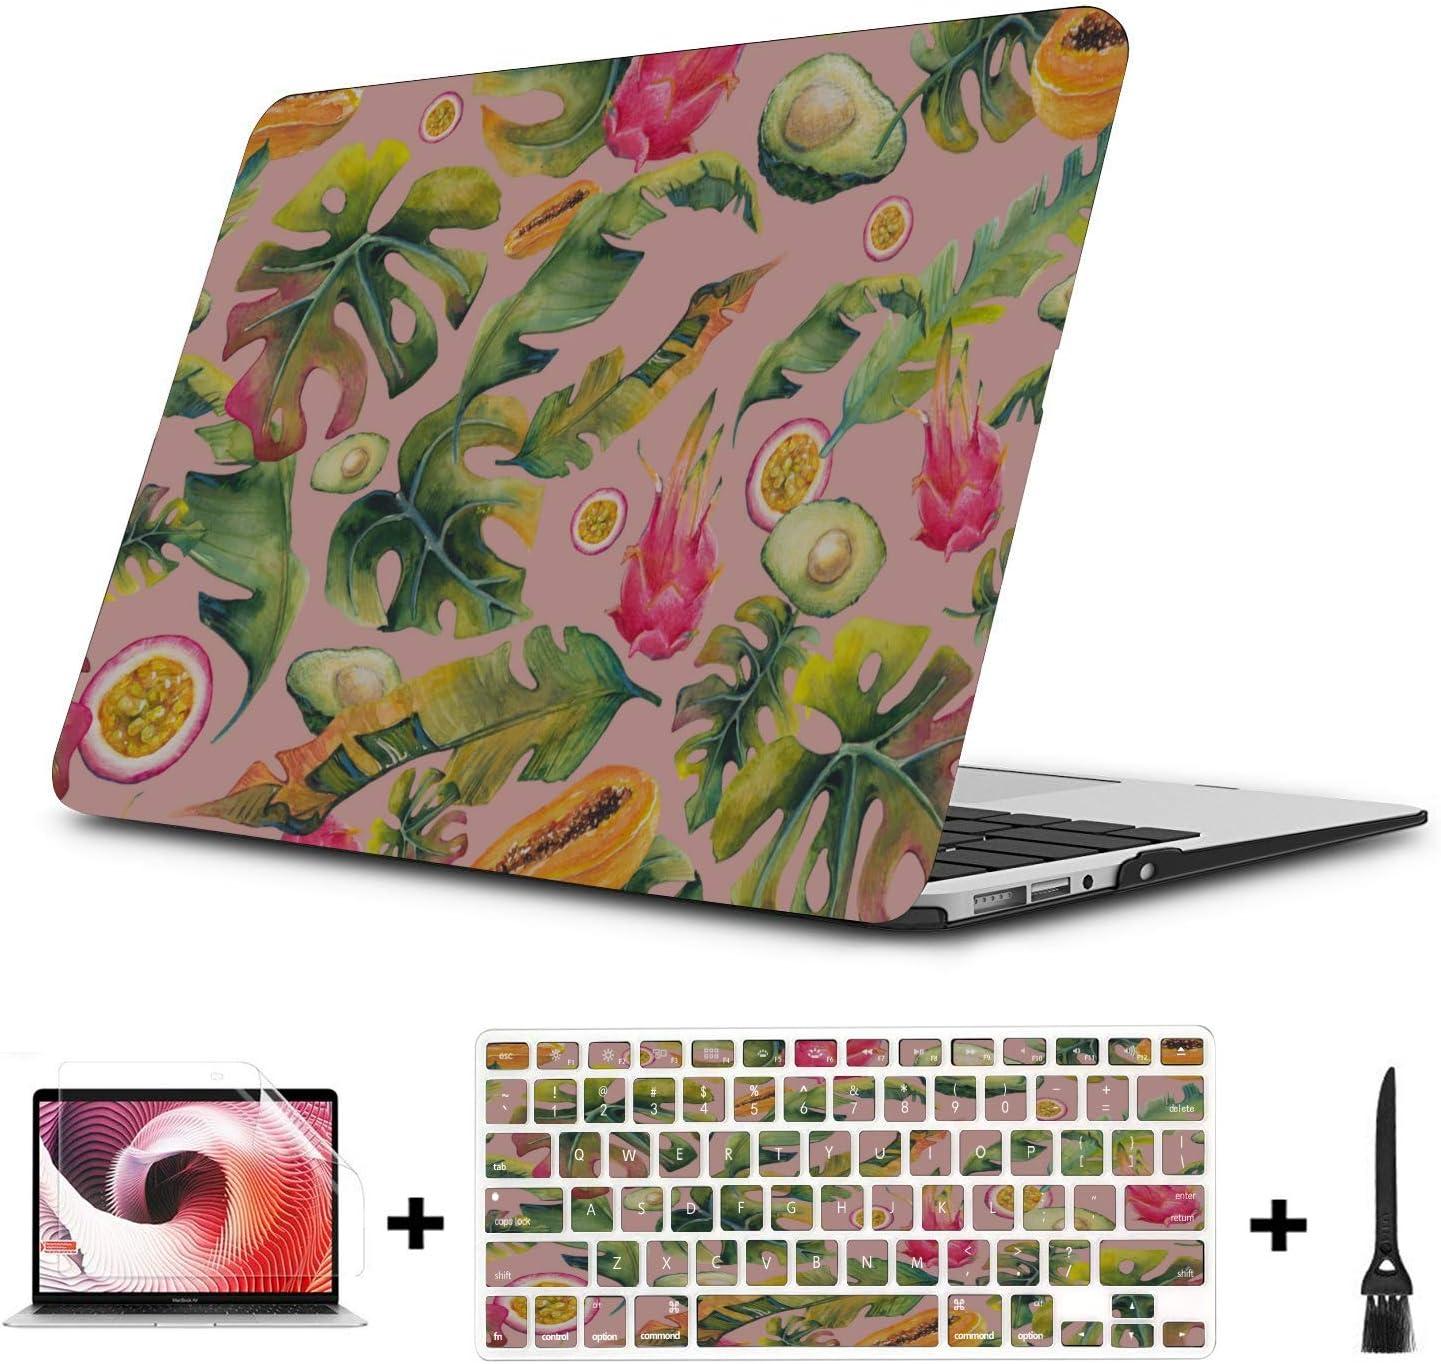 MacBook Protective Case Sweet Art Tropical Fruit Dragon Leaf Plastic Hard Shell Compatible Mac Air 11 Pro 13 15 MacBook Pro Cases Protection for MacBook 2016-2019 Version